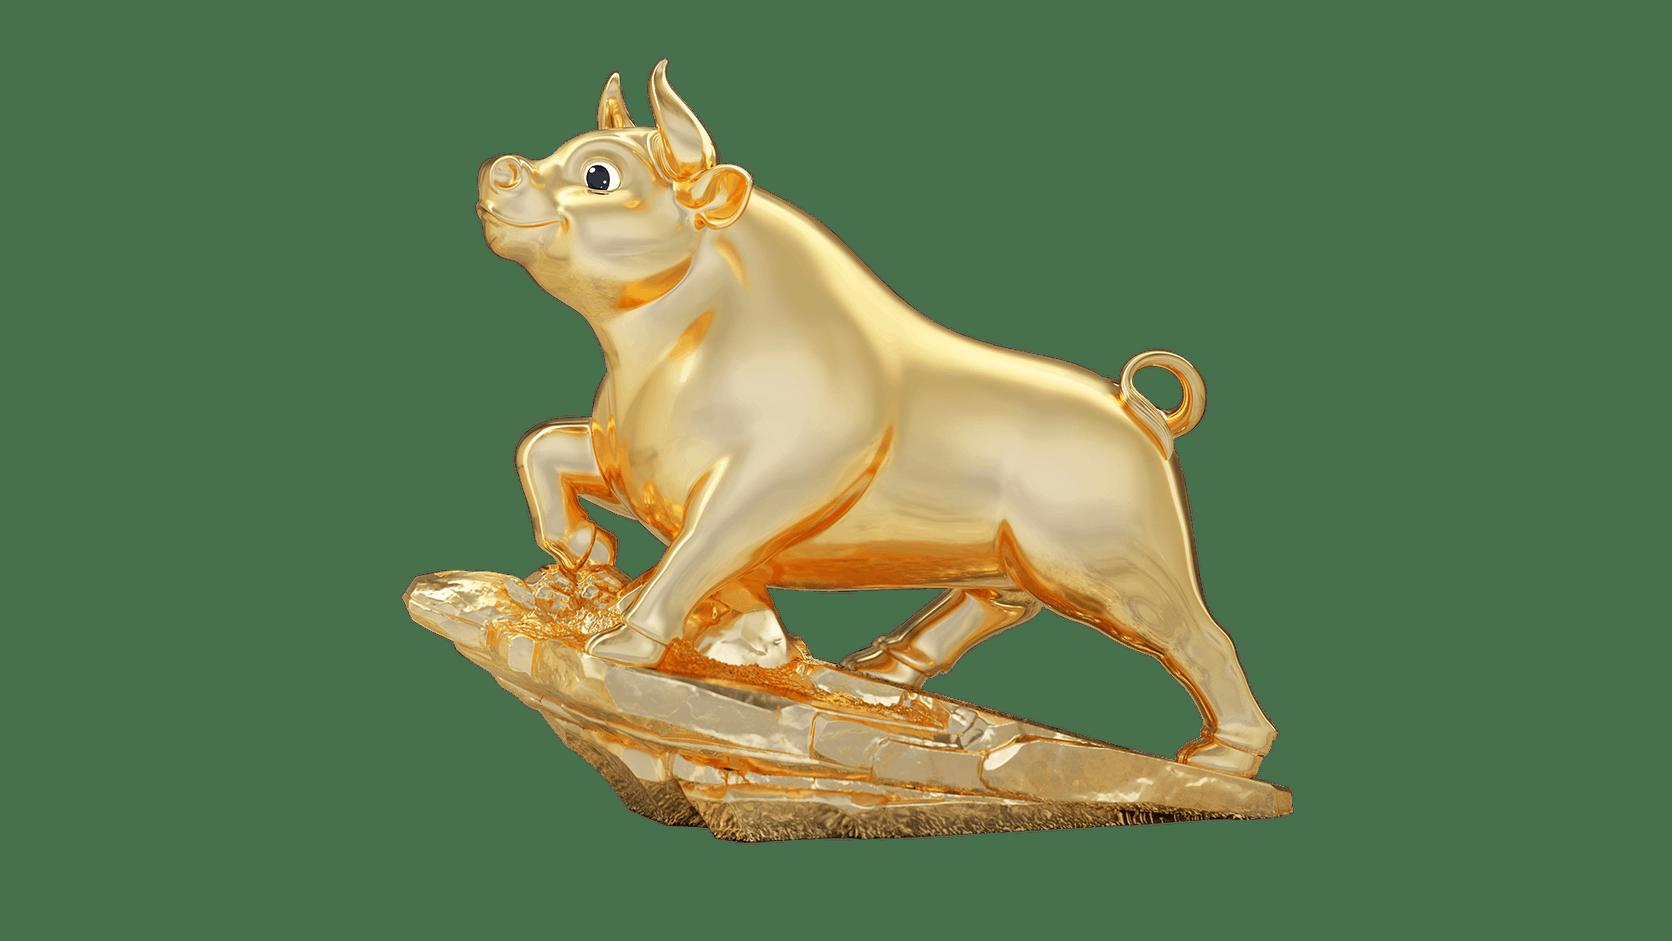 Website bán hàng   Gốm sứ cao cấp Minh Long I